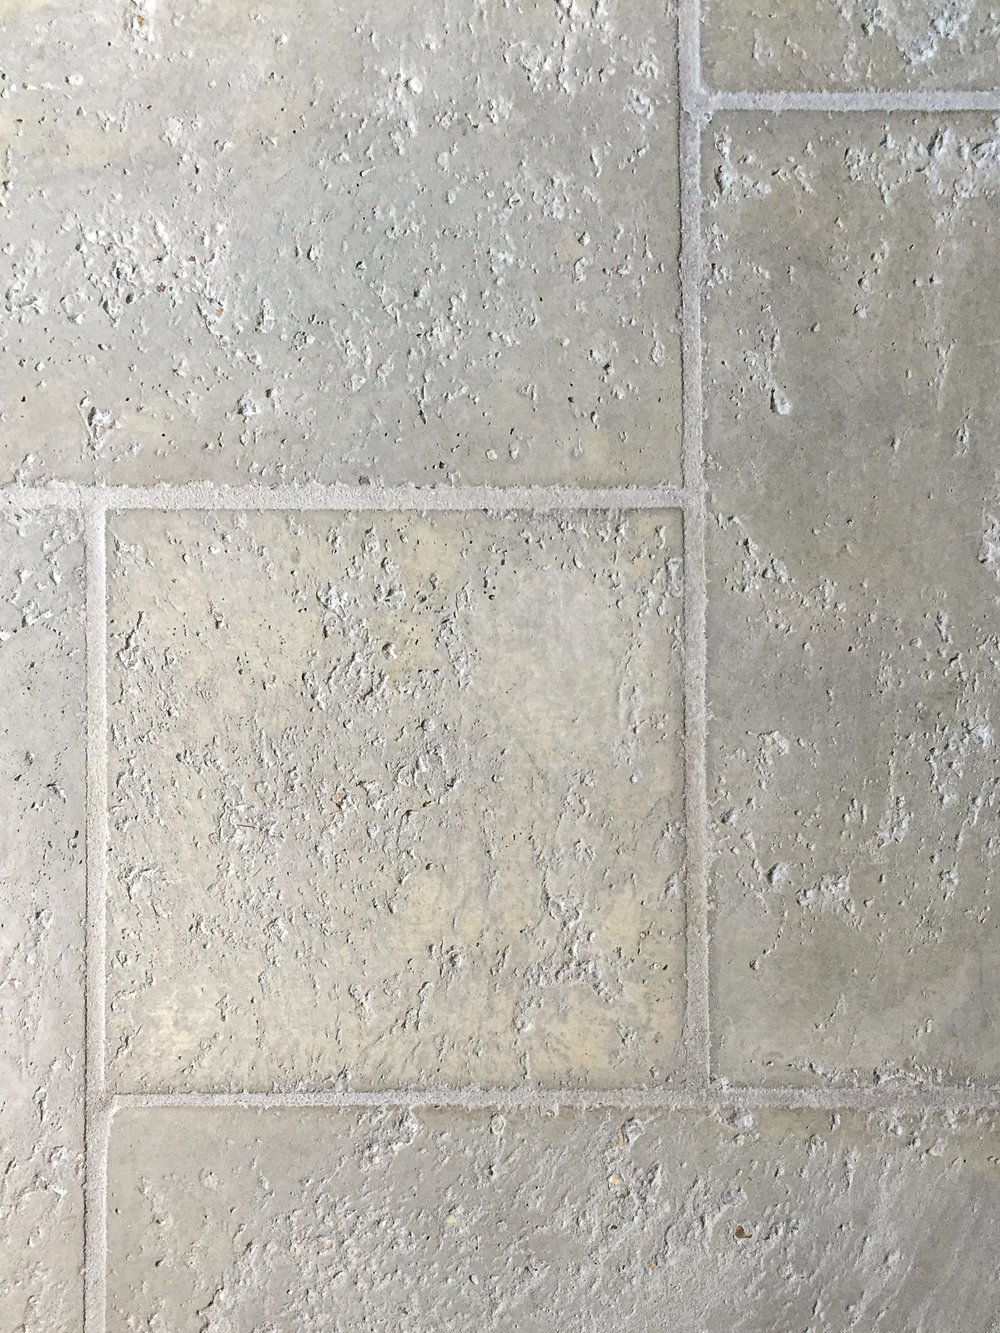 Detail-47.jpg